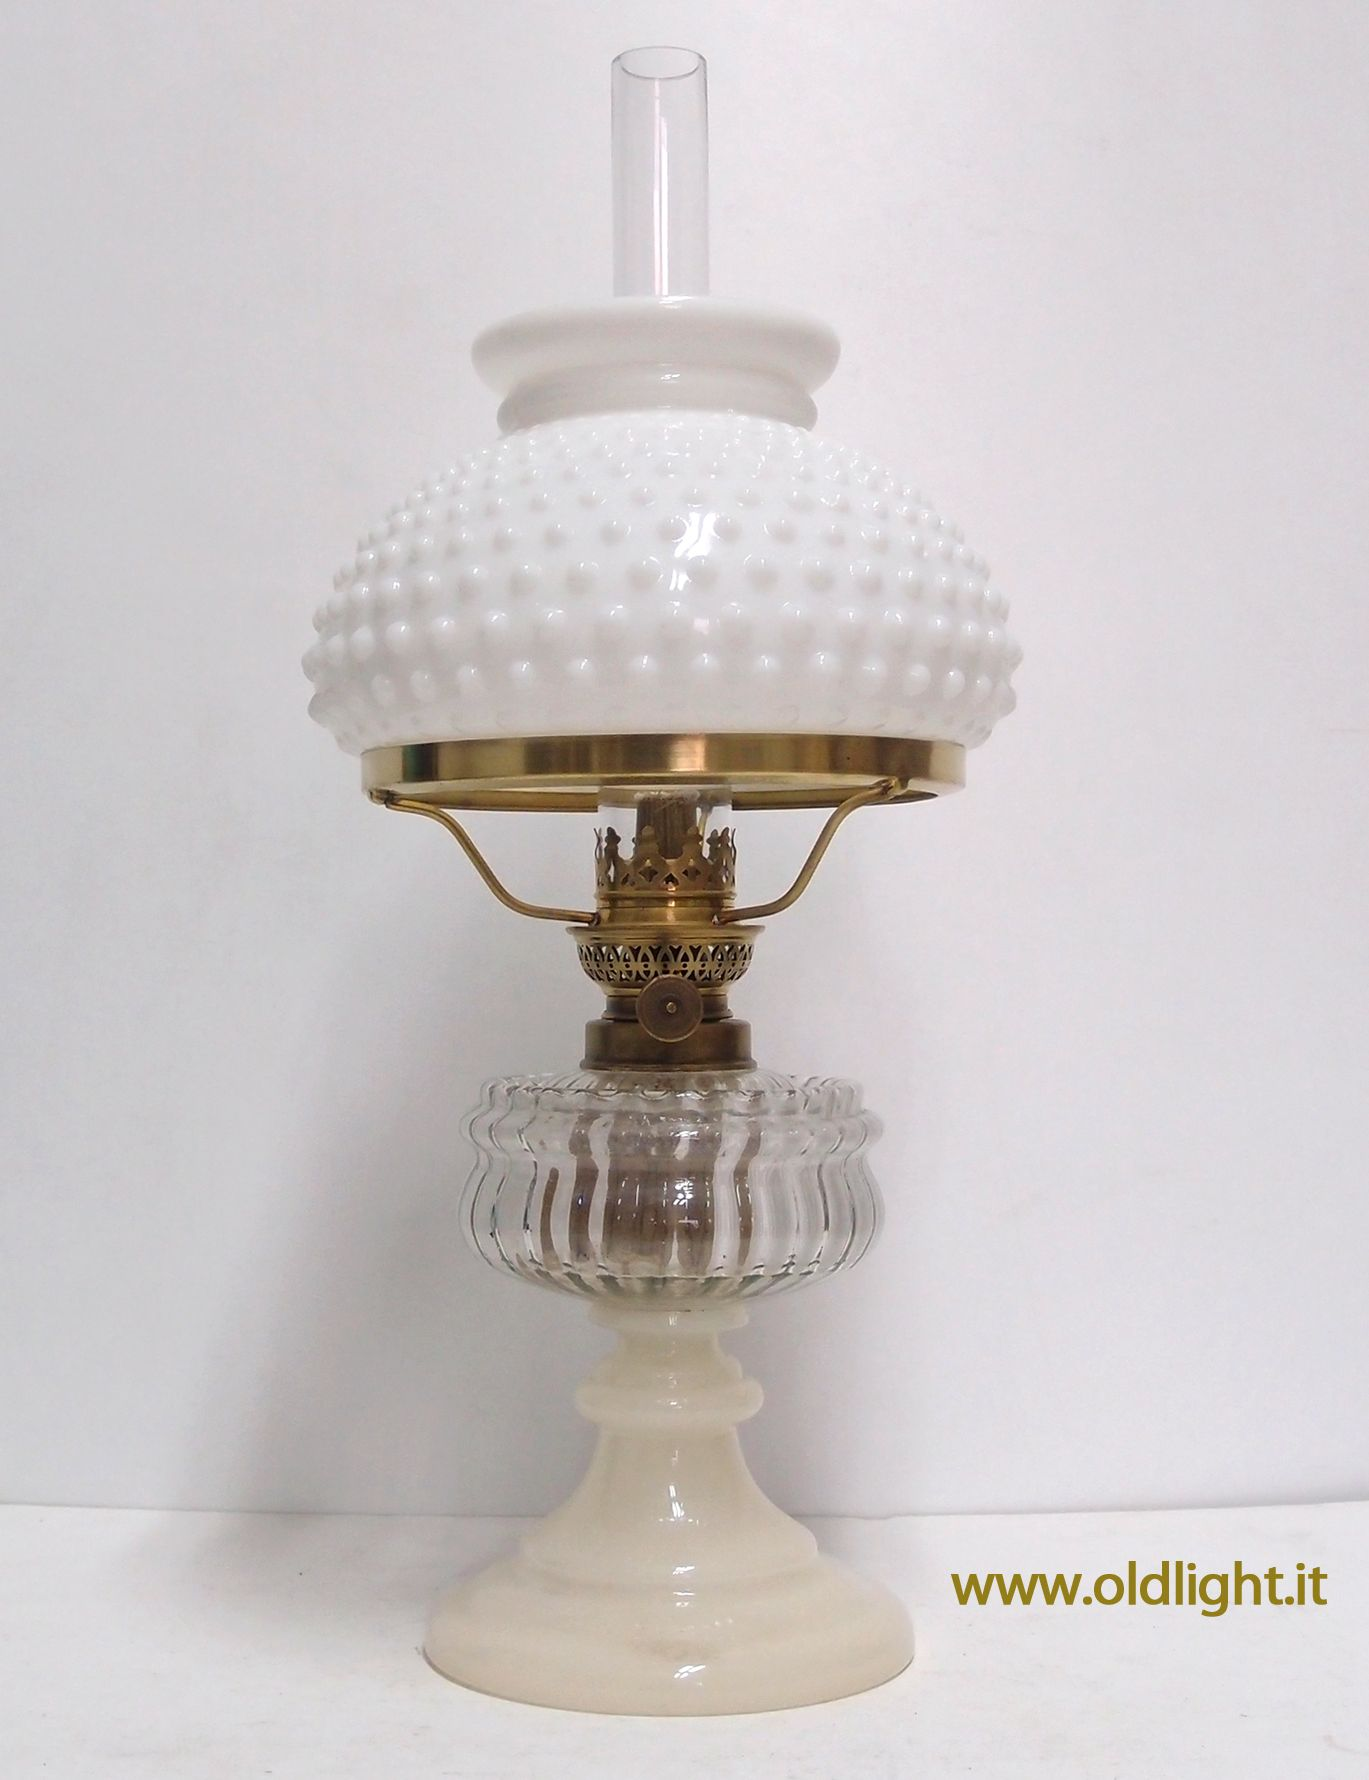 Lampada in opaline e vetro trasparente ( rara e pregiata combinazione ); para...